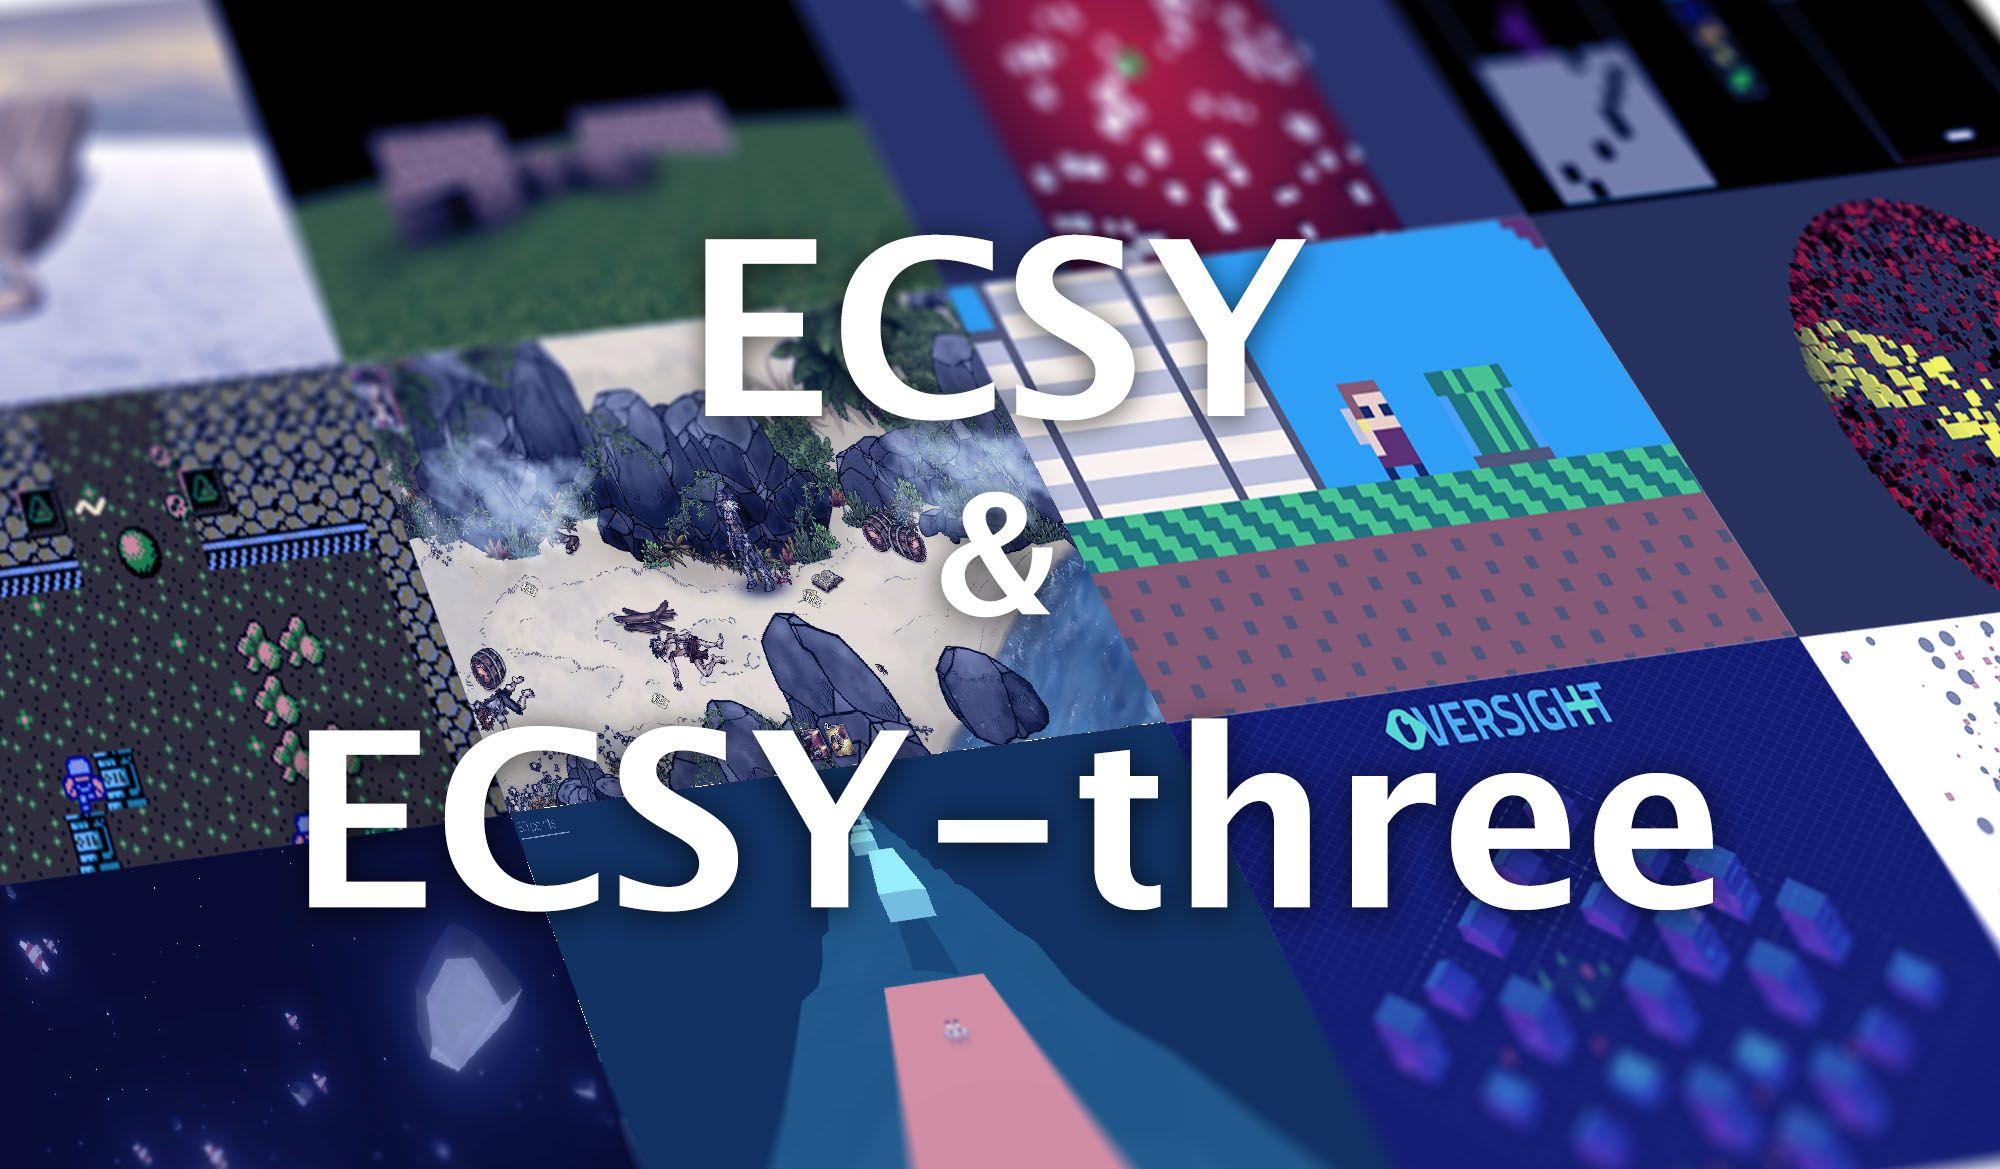 What's new in ECSY v0.4 and ECSY-THREE v0.1